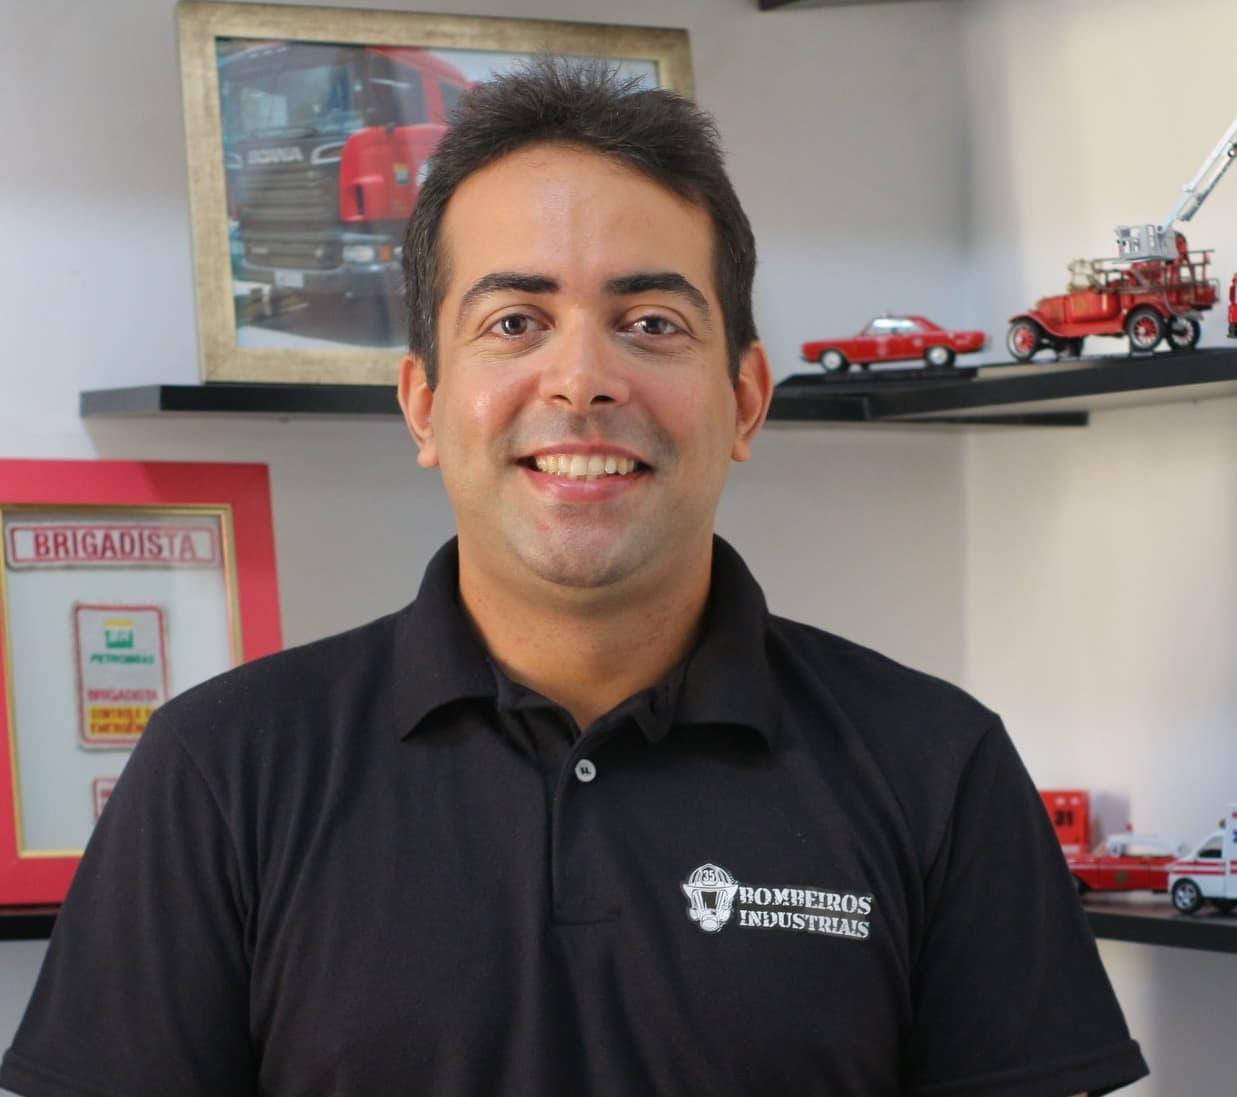 Paulo Renato Soares